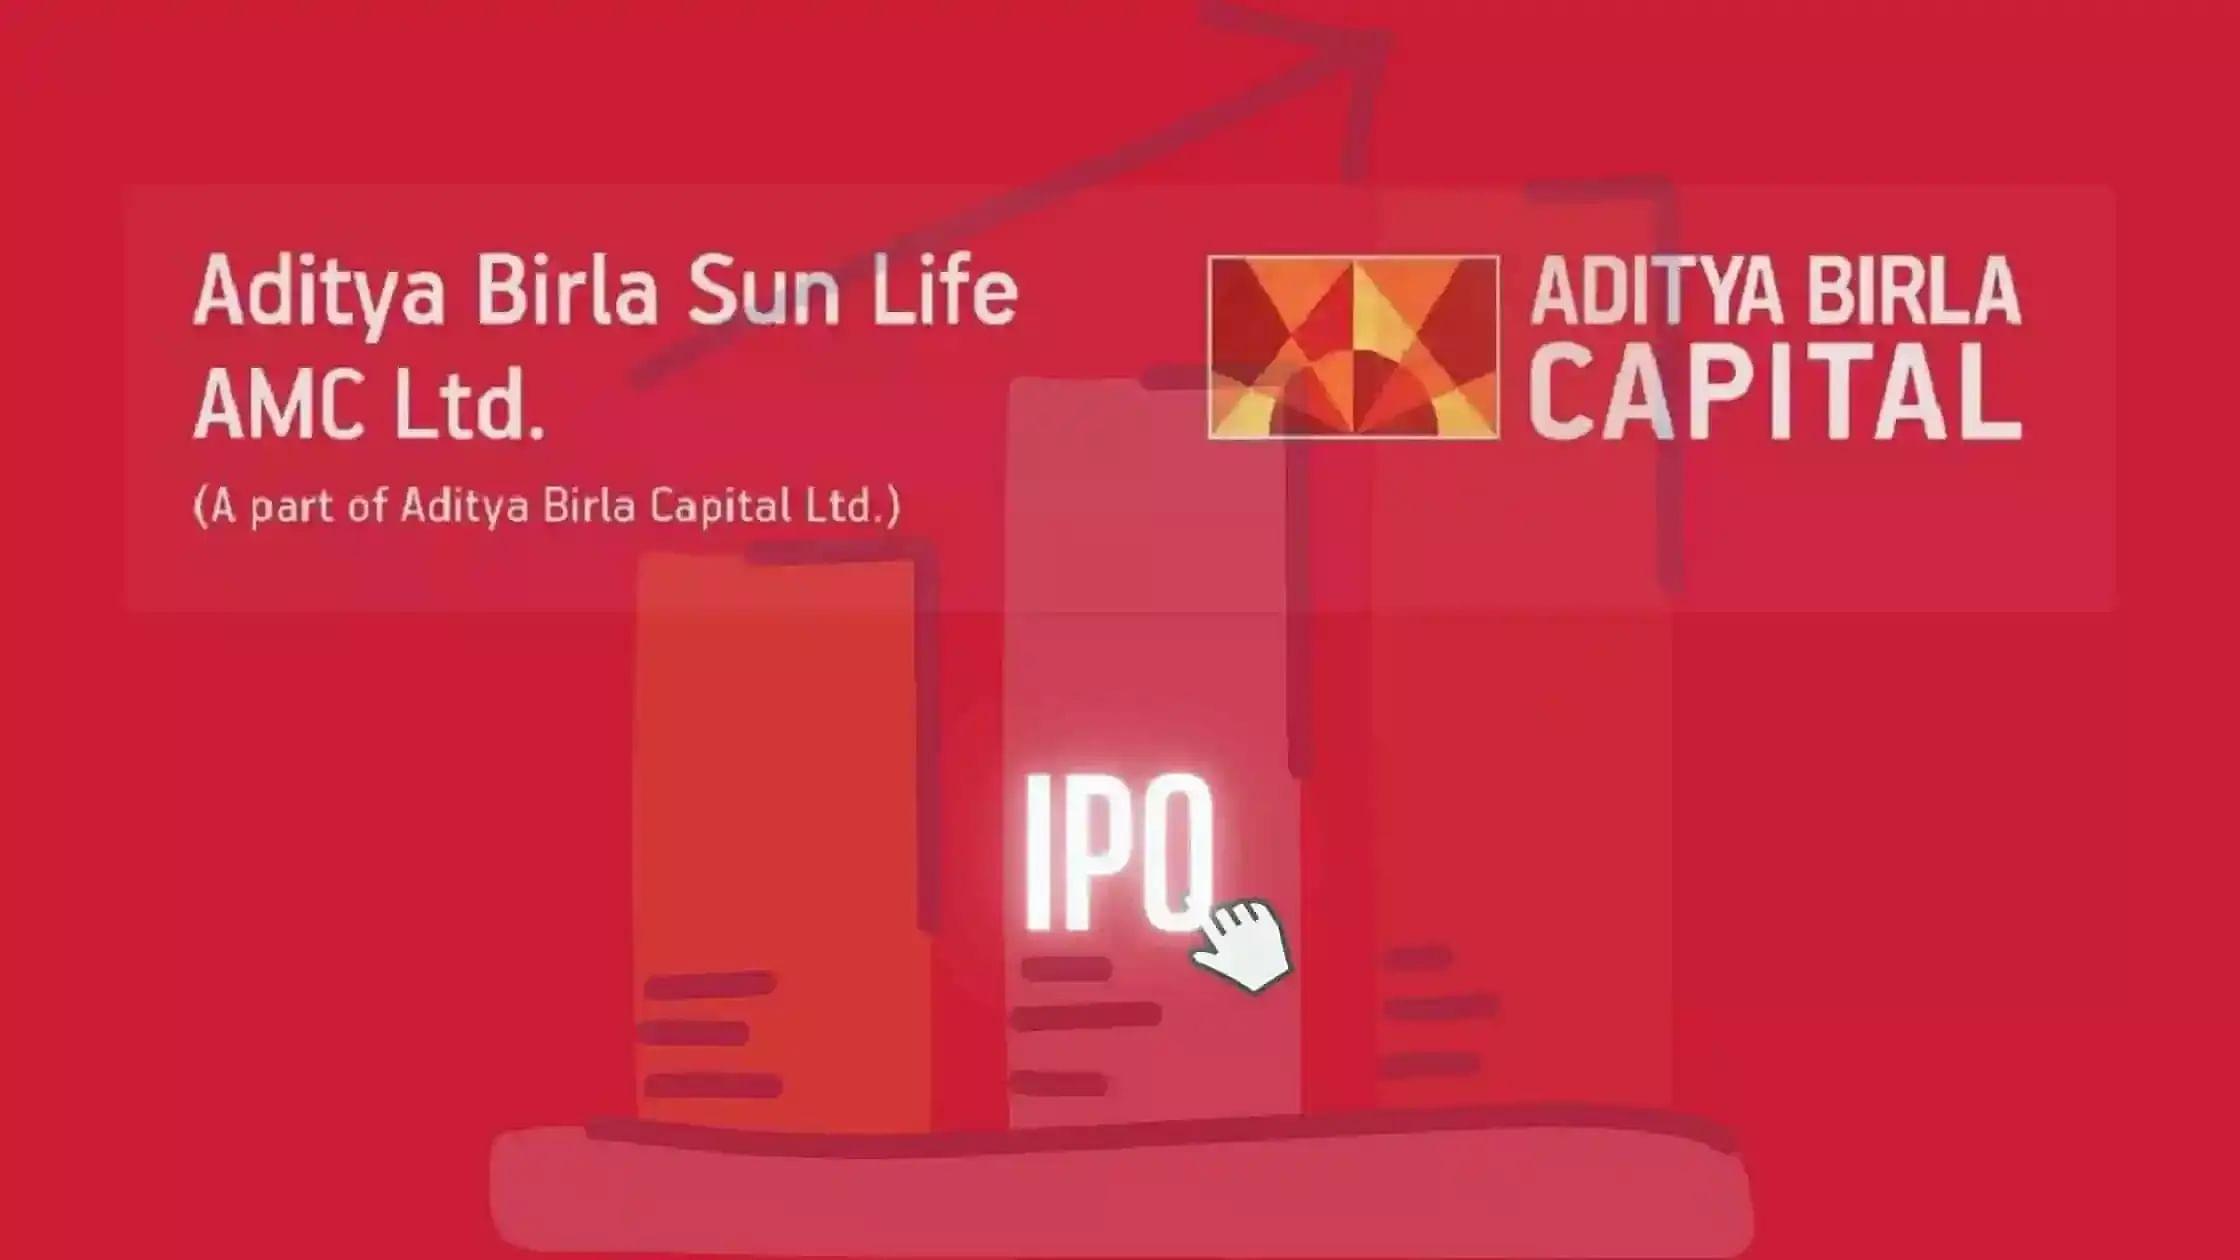 Aditya Birla Sun Life AMC Debut On Share Market; Stocks Trade At Rs 715 On 1st Day